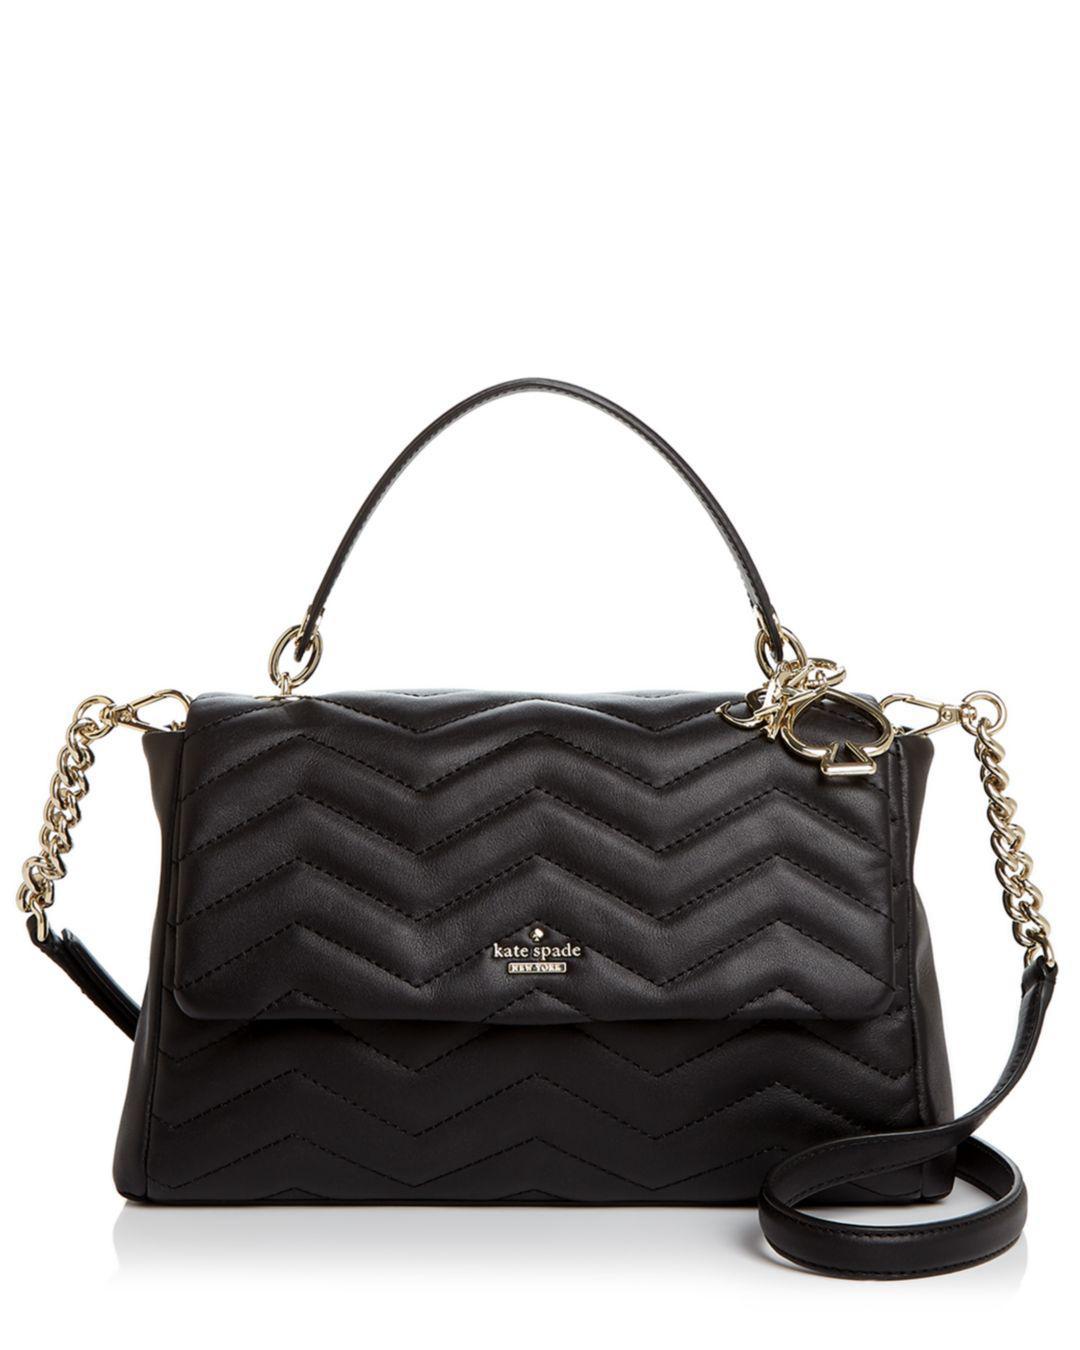 f87dd75e9d Kate Spade Reese Park Ivory Medium Leather Shoulder Bag in Black - Lyst